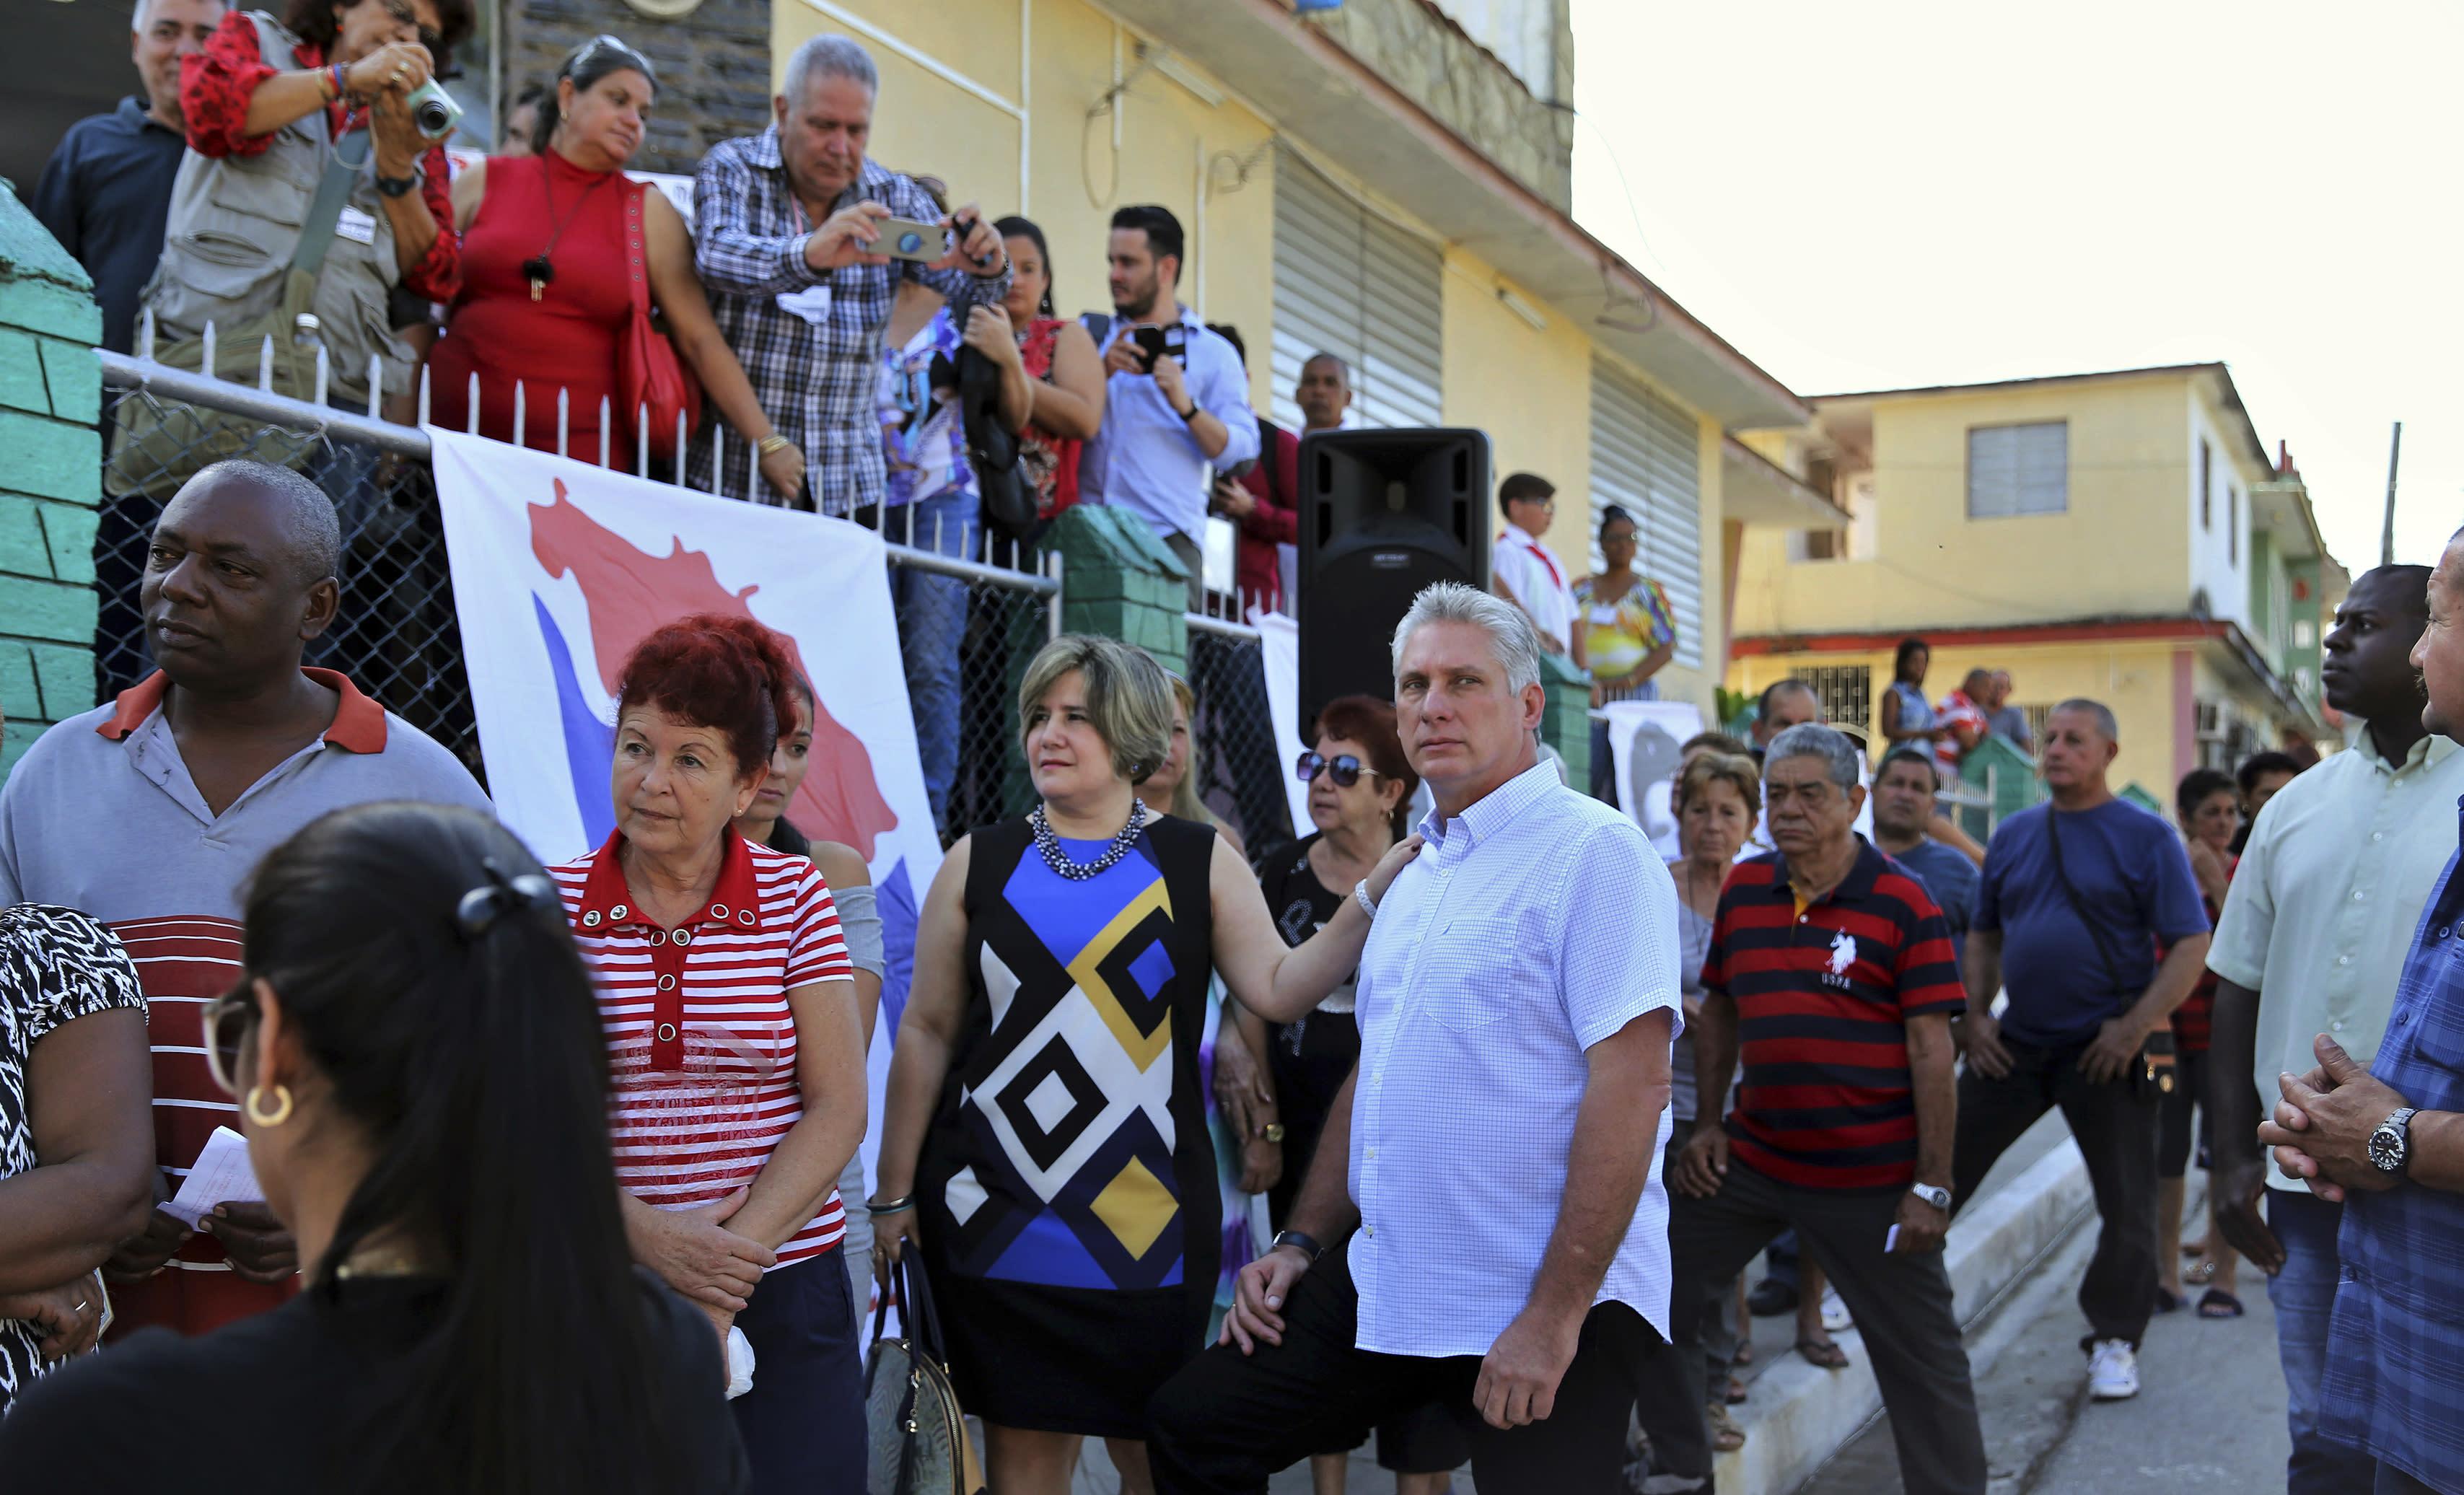 THE NEW TYRANT OF CUBA